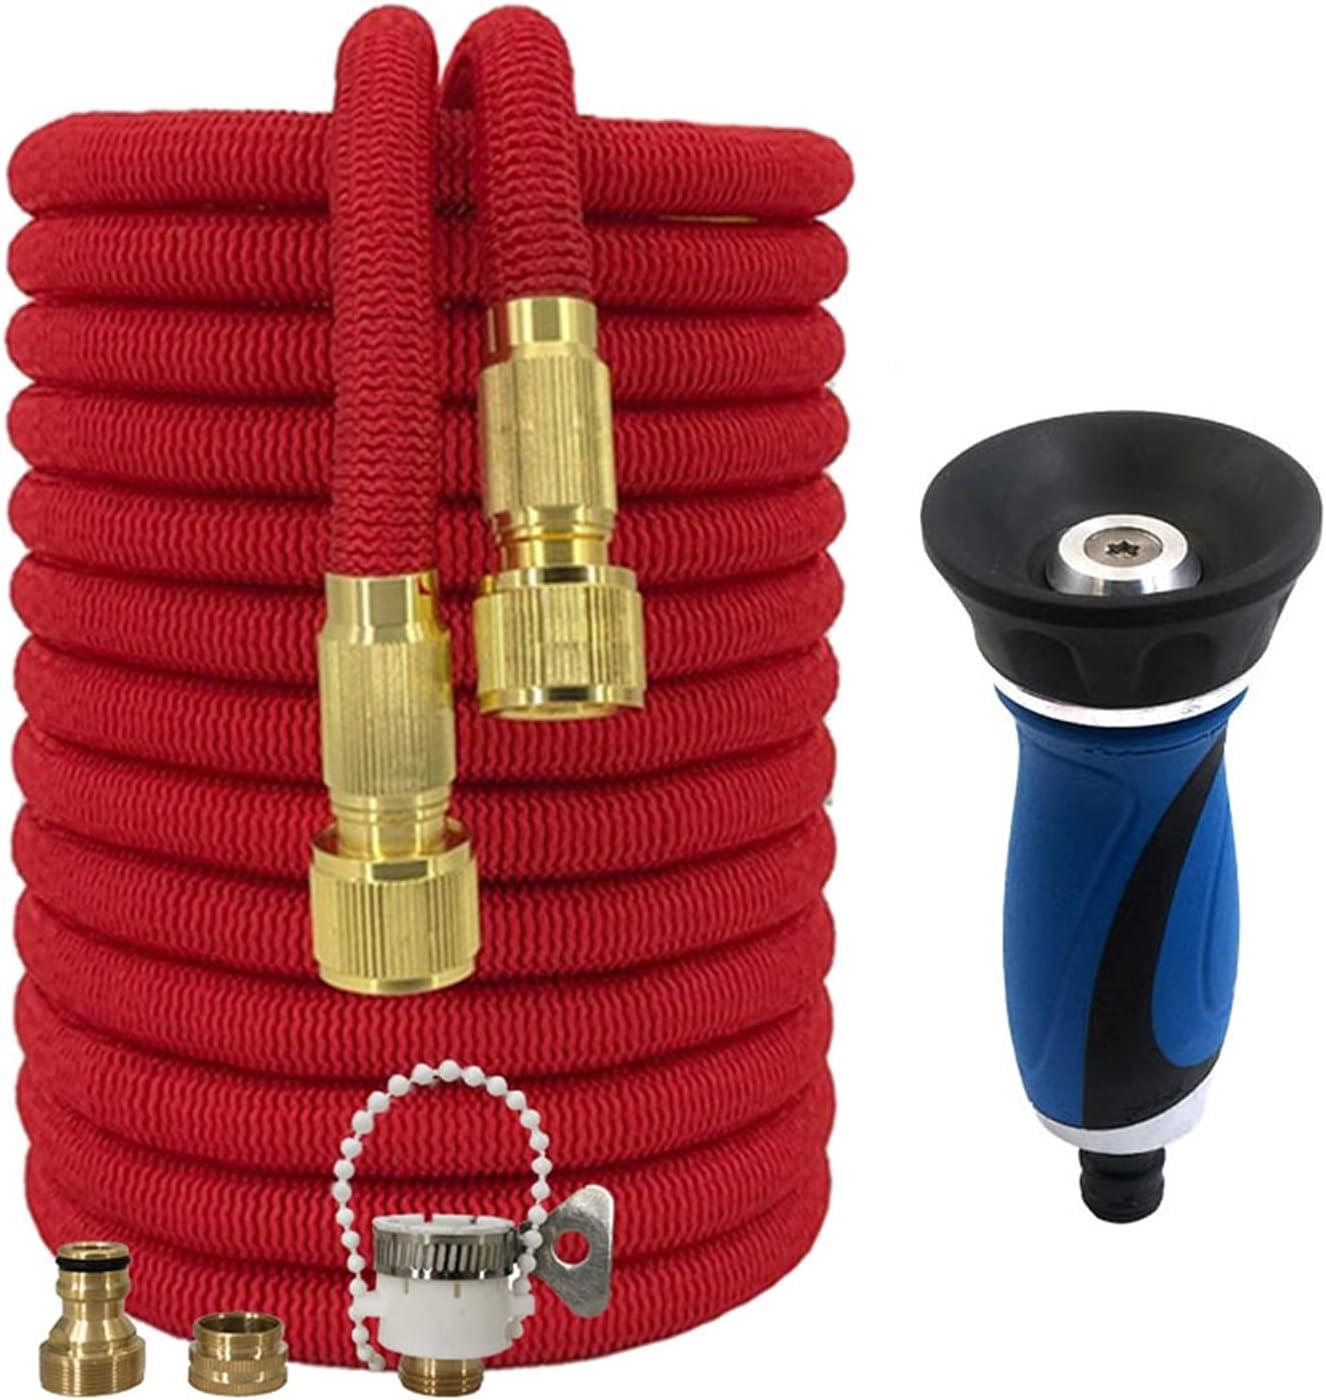 CJWSLYT Garden Hoses Nozzle Hose Fl Expandable Water Flow Max 87% Washington Mall OFF